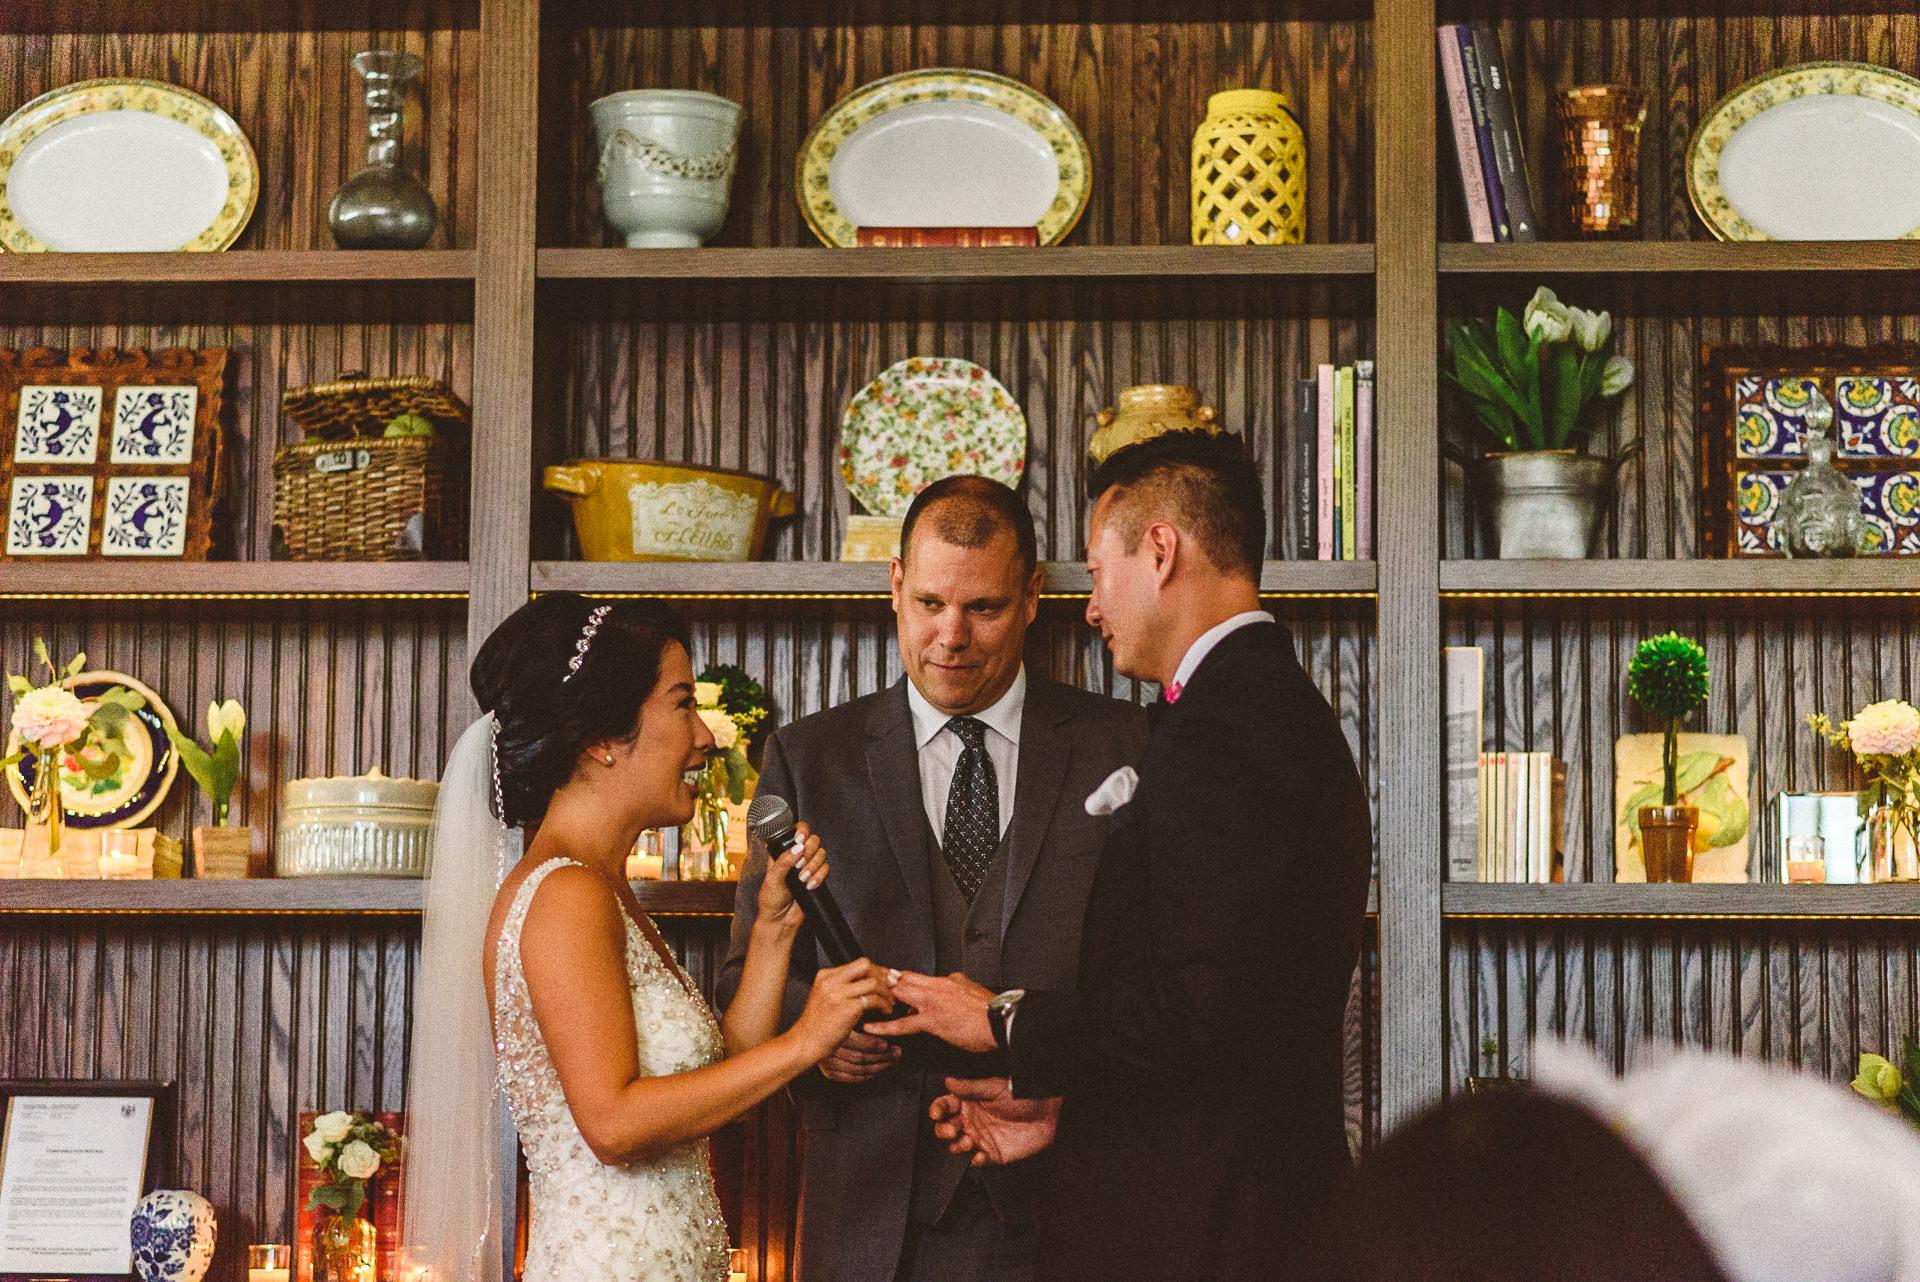 Ring Exchange during wedding at Colette Restaurant